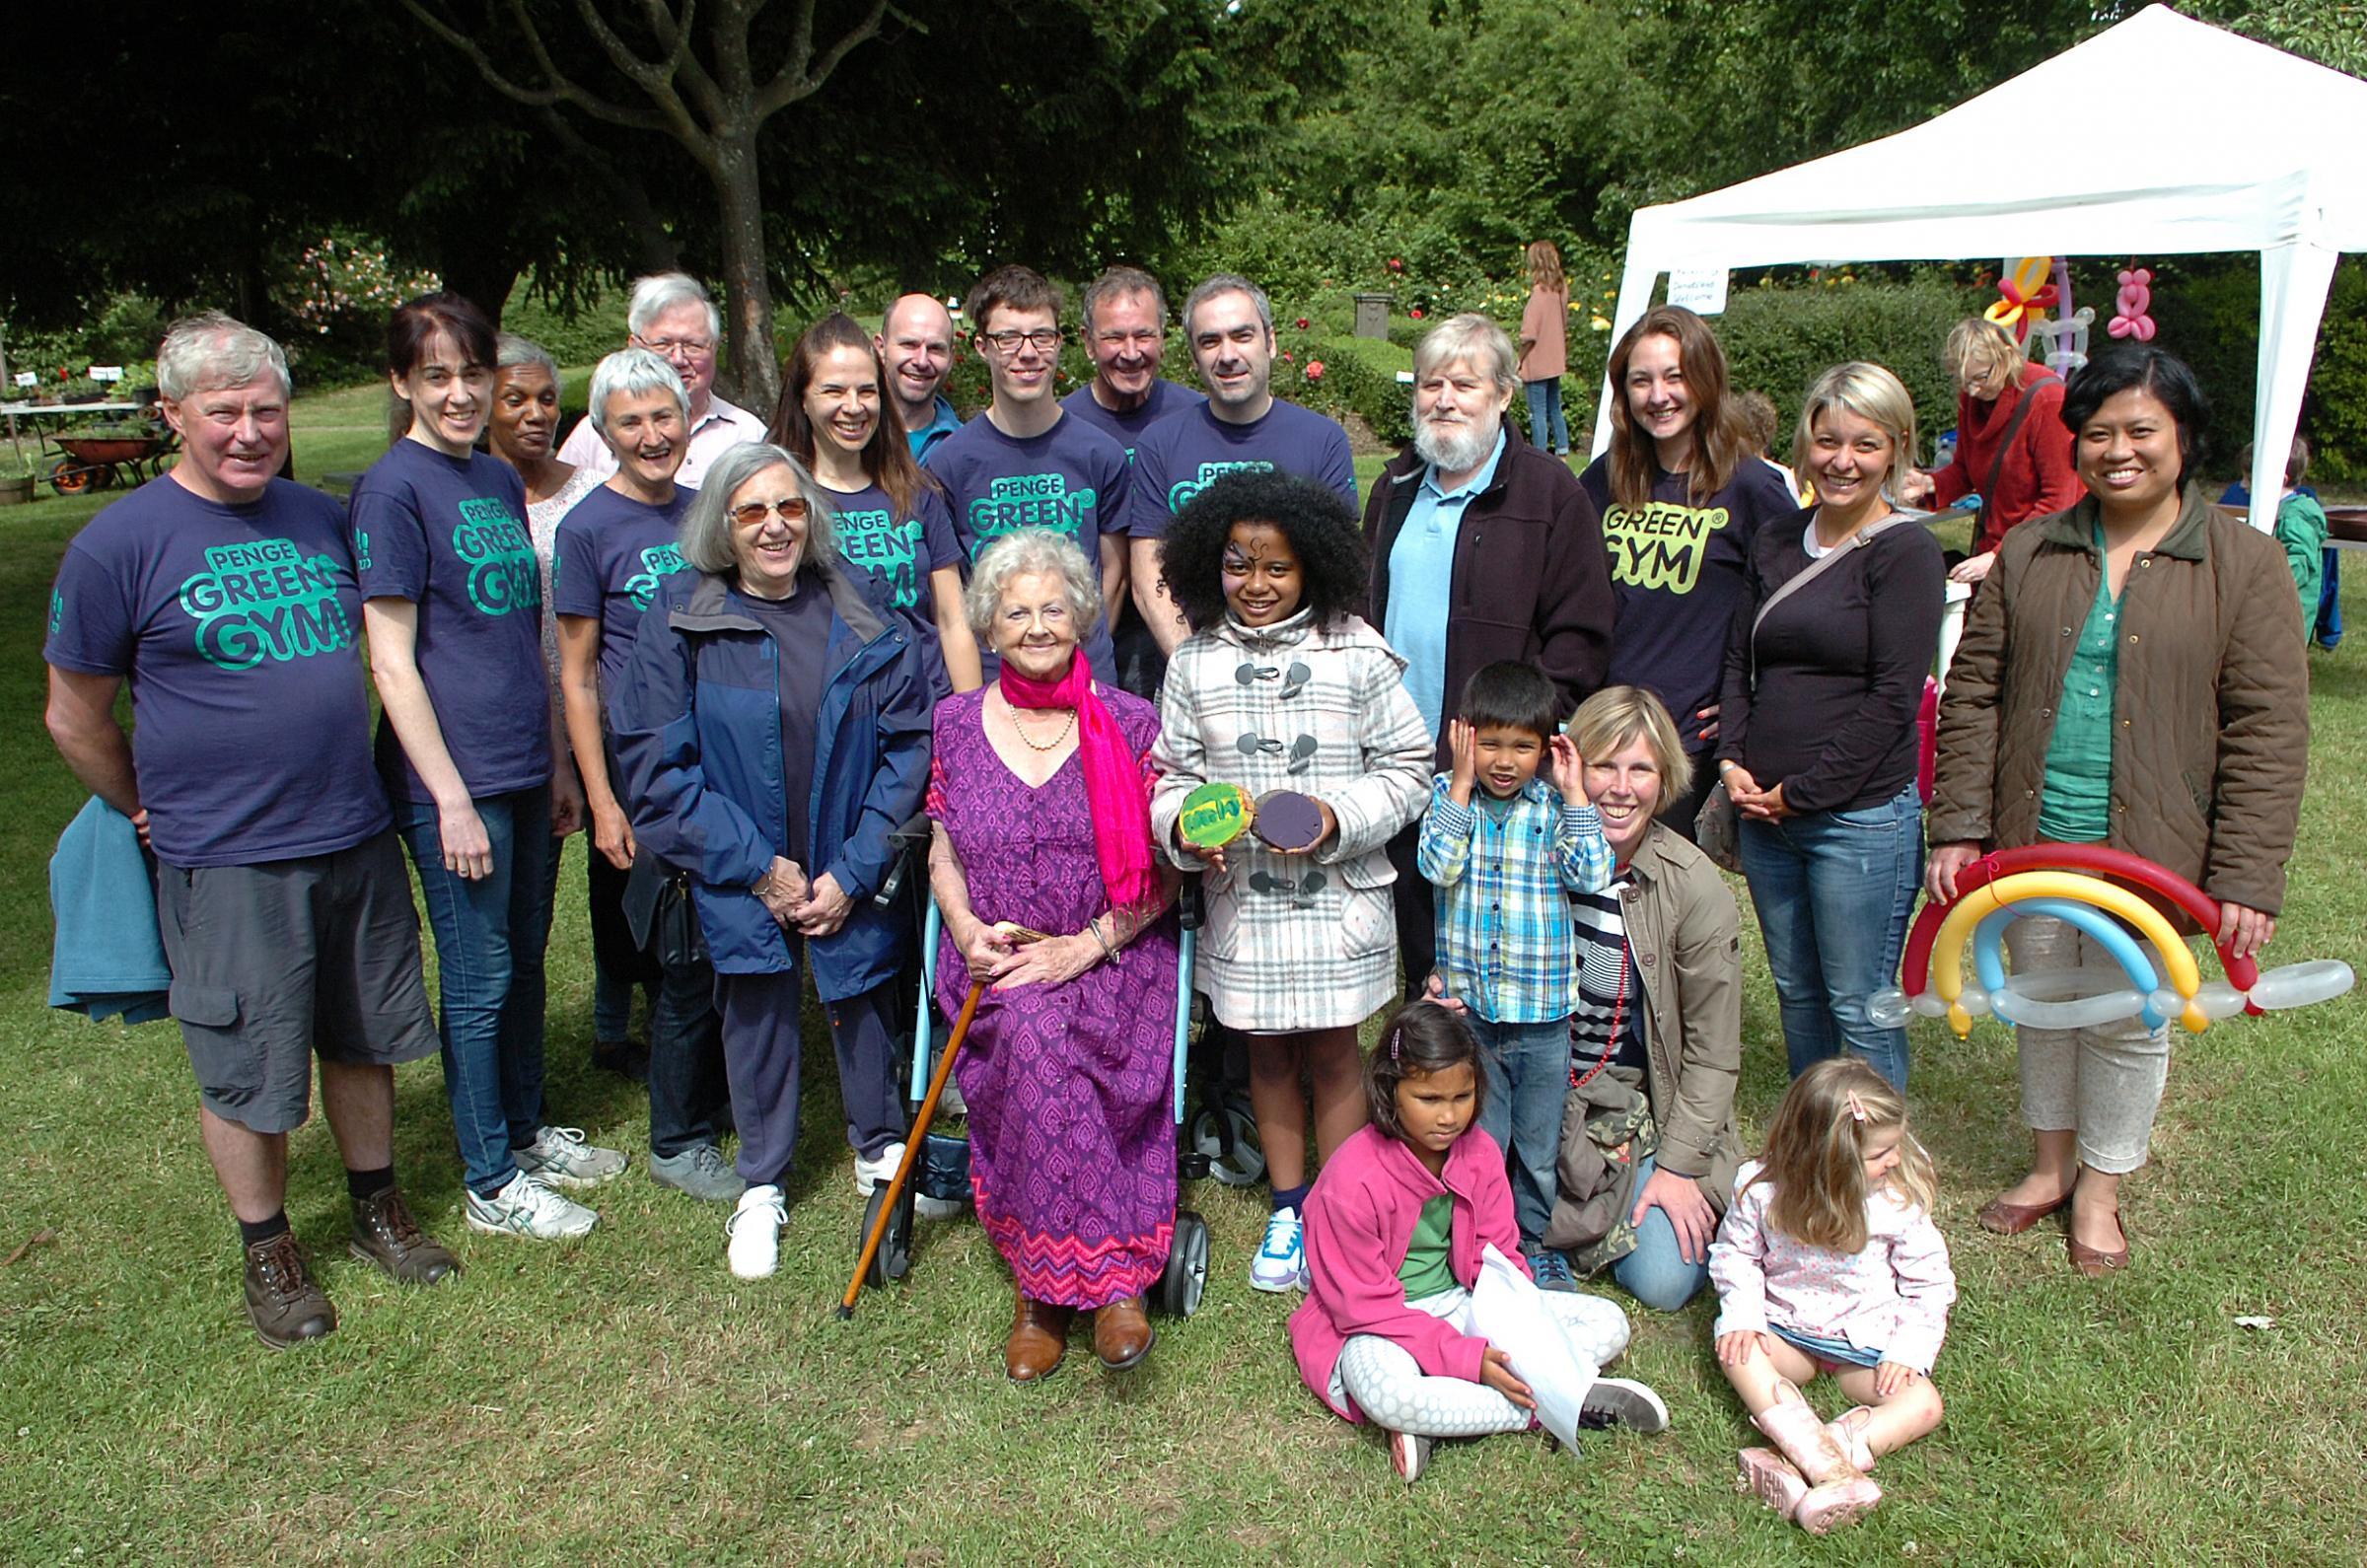 Winsford Gardens Penge Green Gym - 2nd Best Community Garden